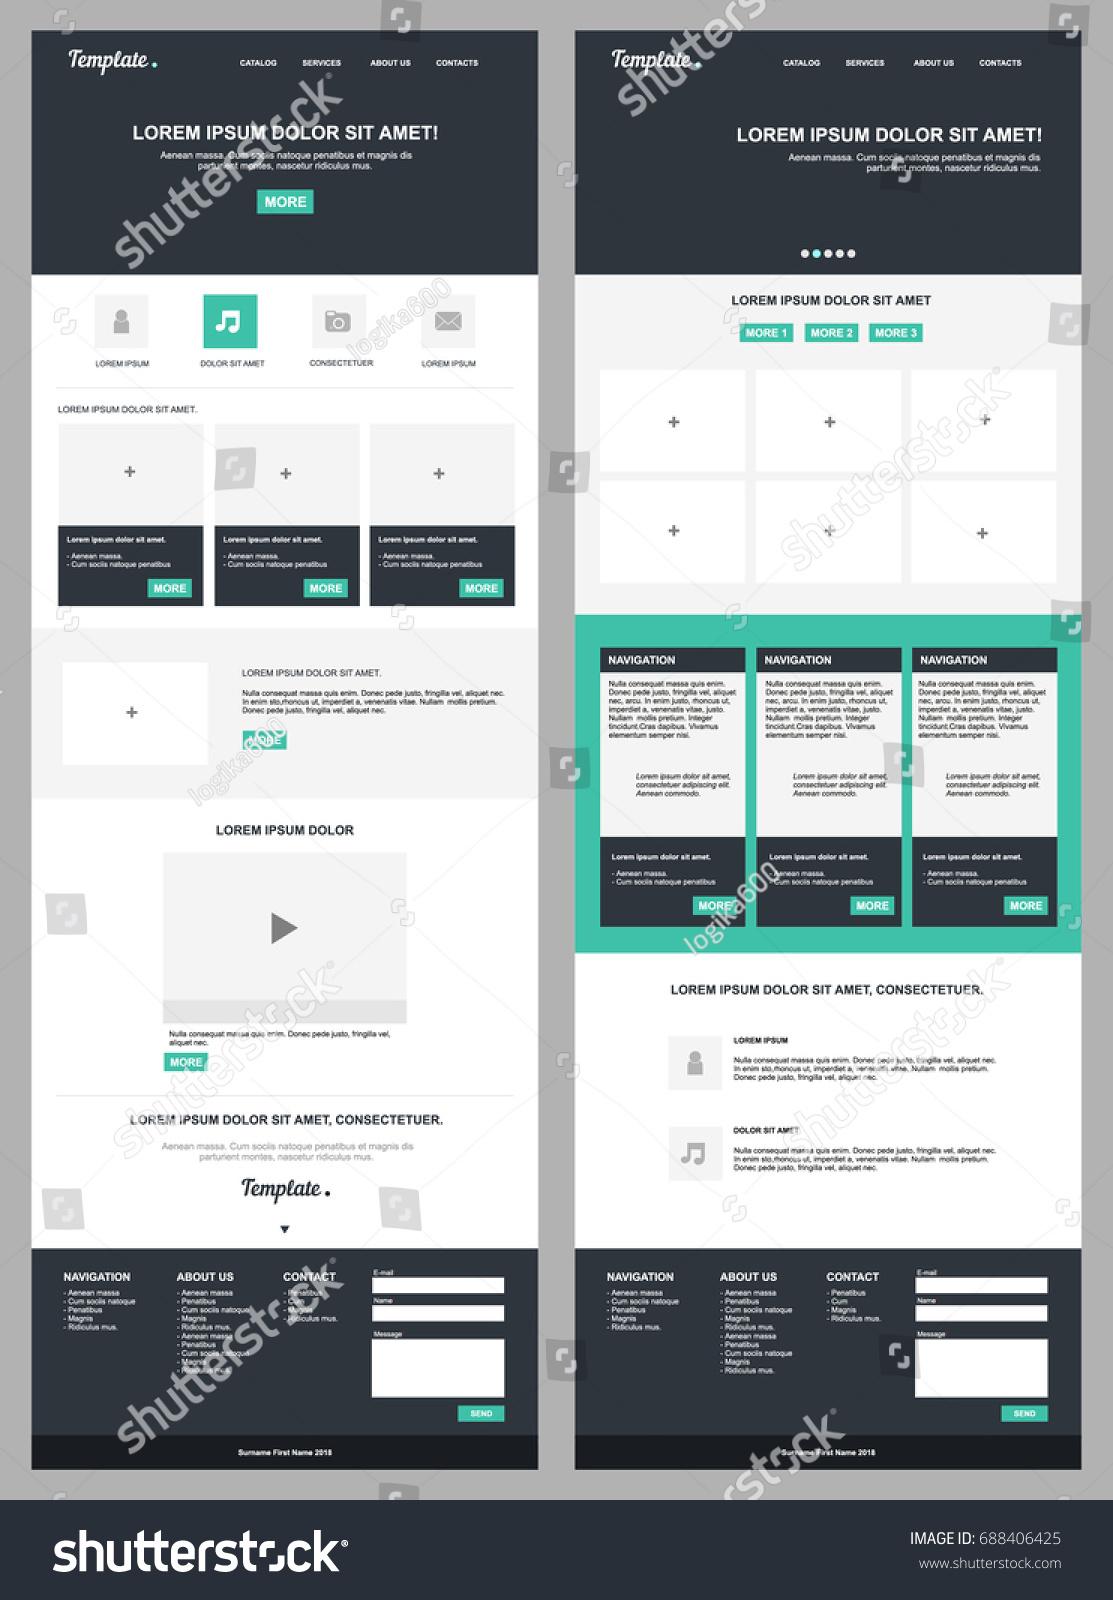 Free modern website design templates dabeetz. Com.